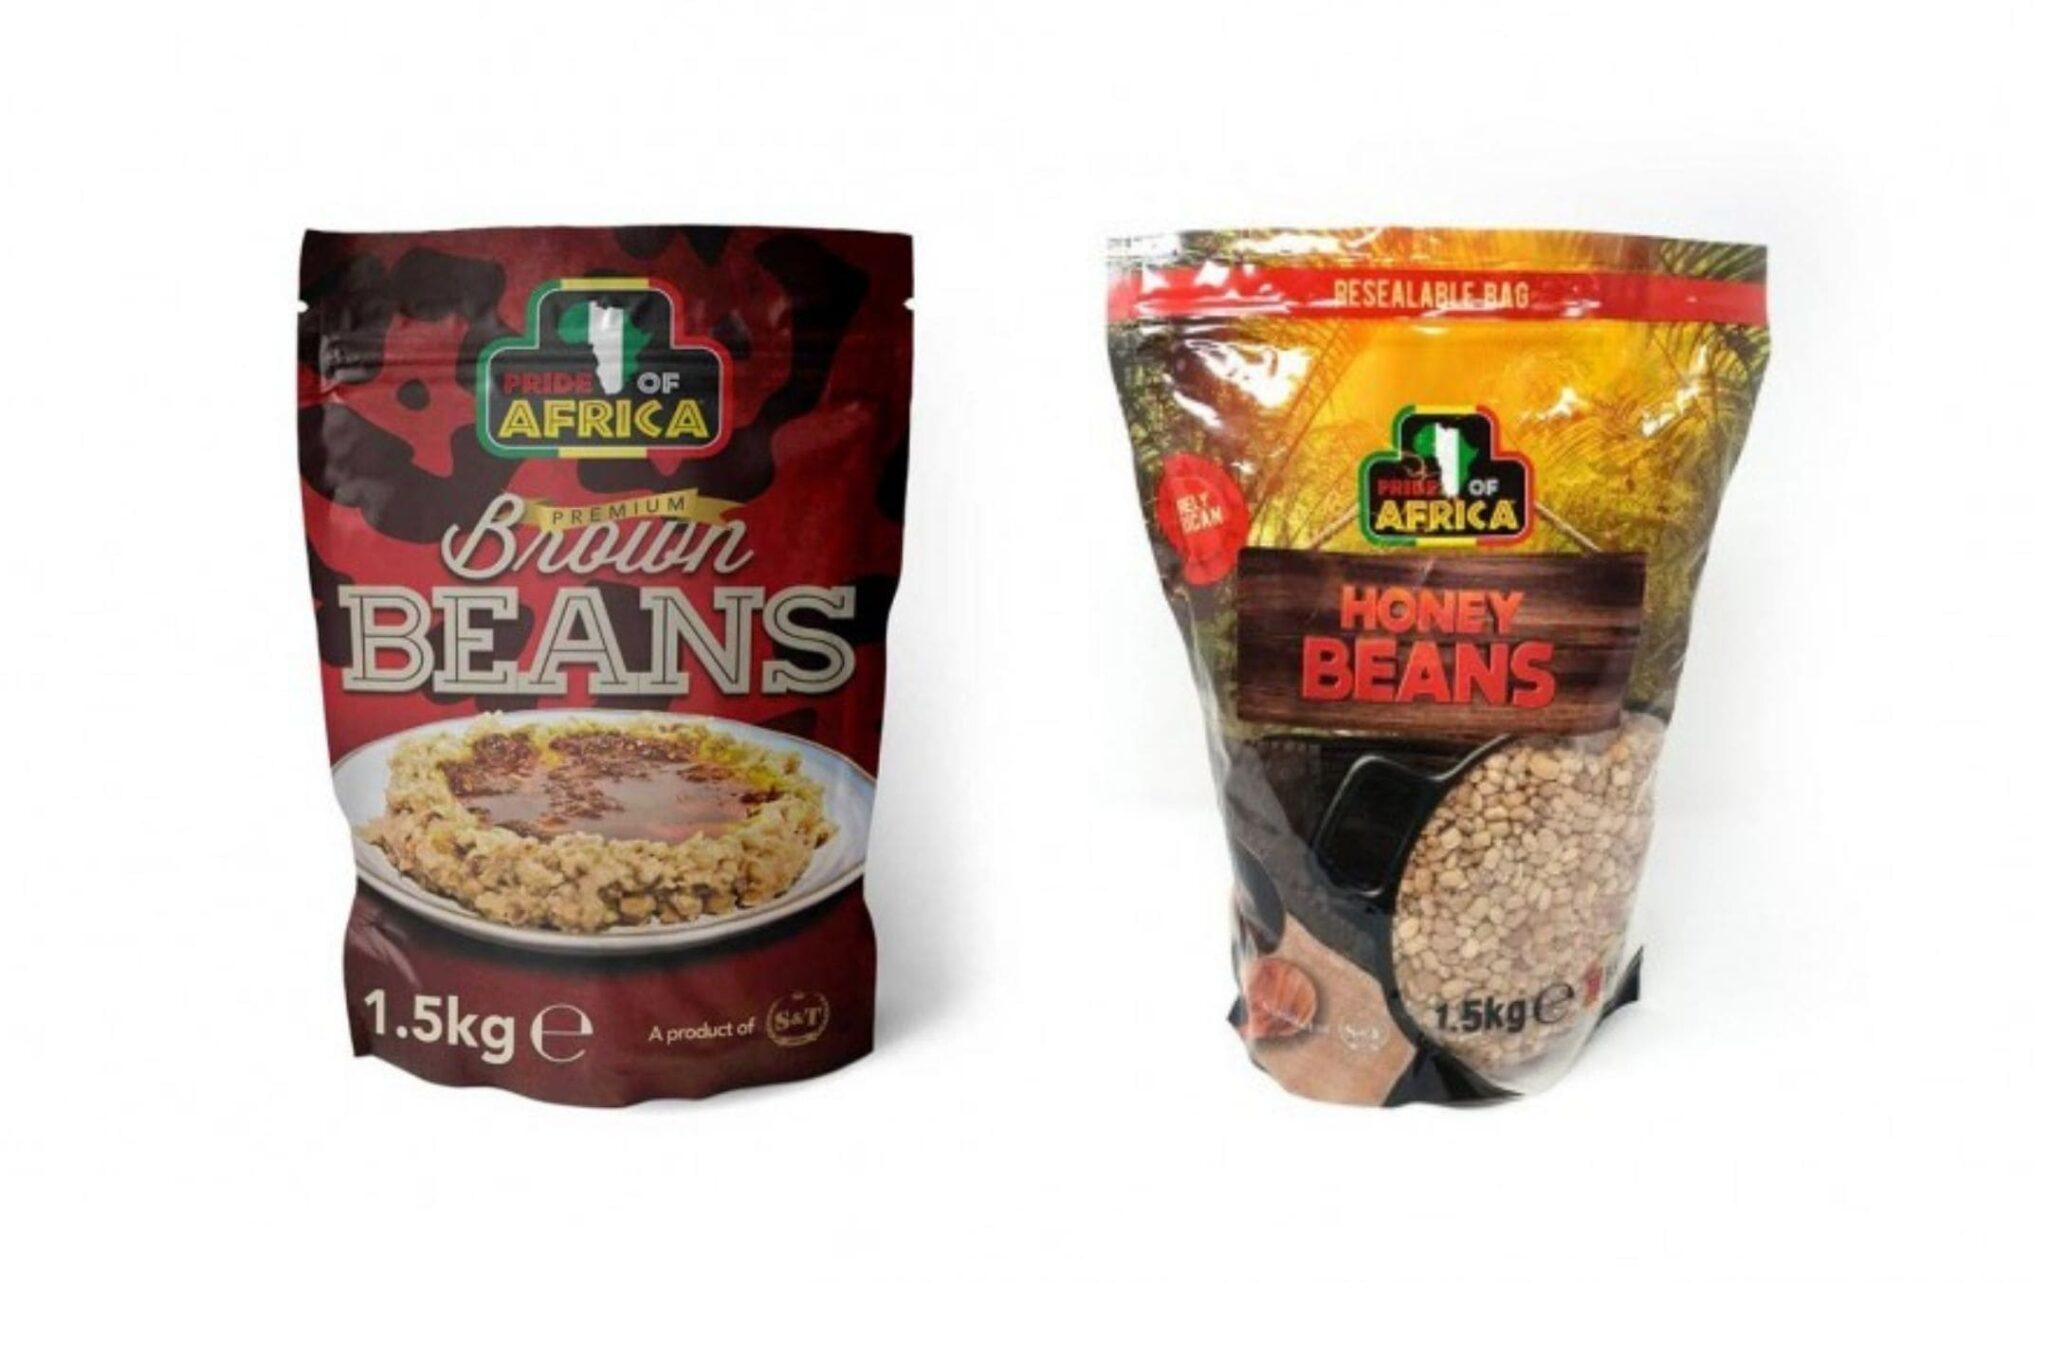 honey bean brown beans product recall